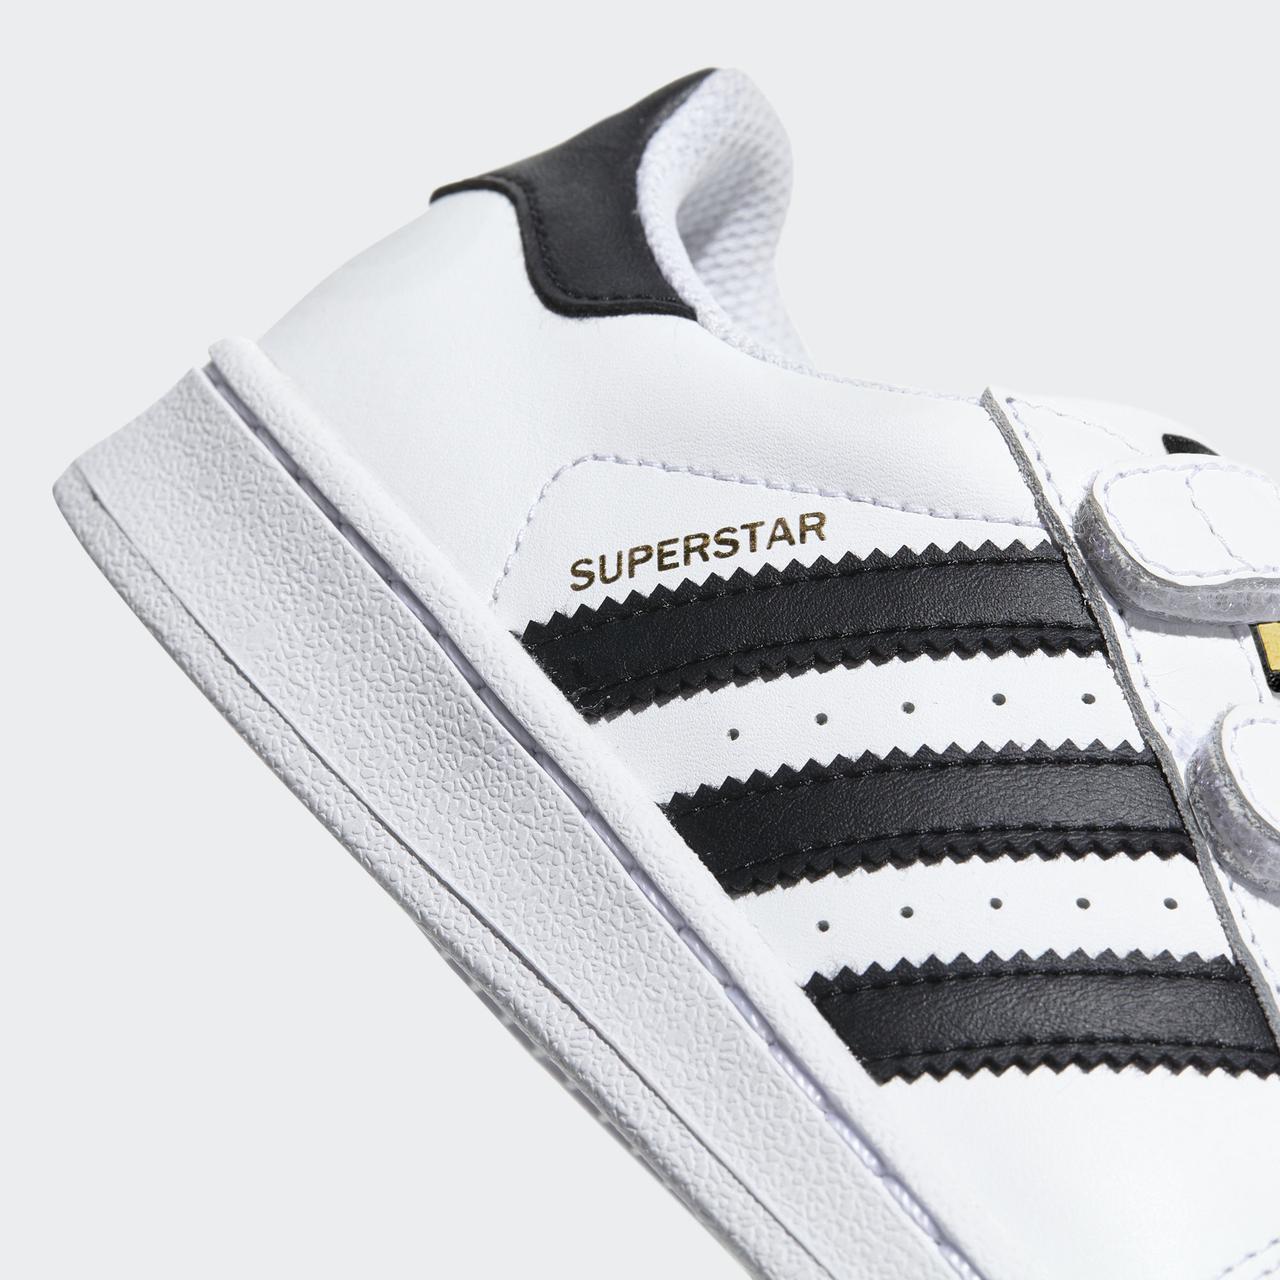 6dbfaac4 ... Детские кроссовки Adidas Originals Superstar Foundation (Артикул:  B26070), ...